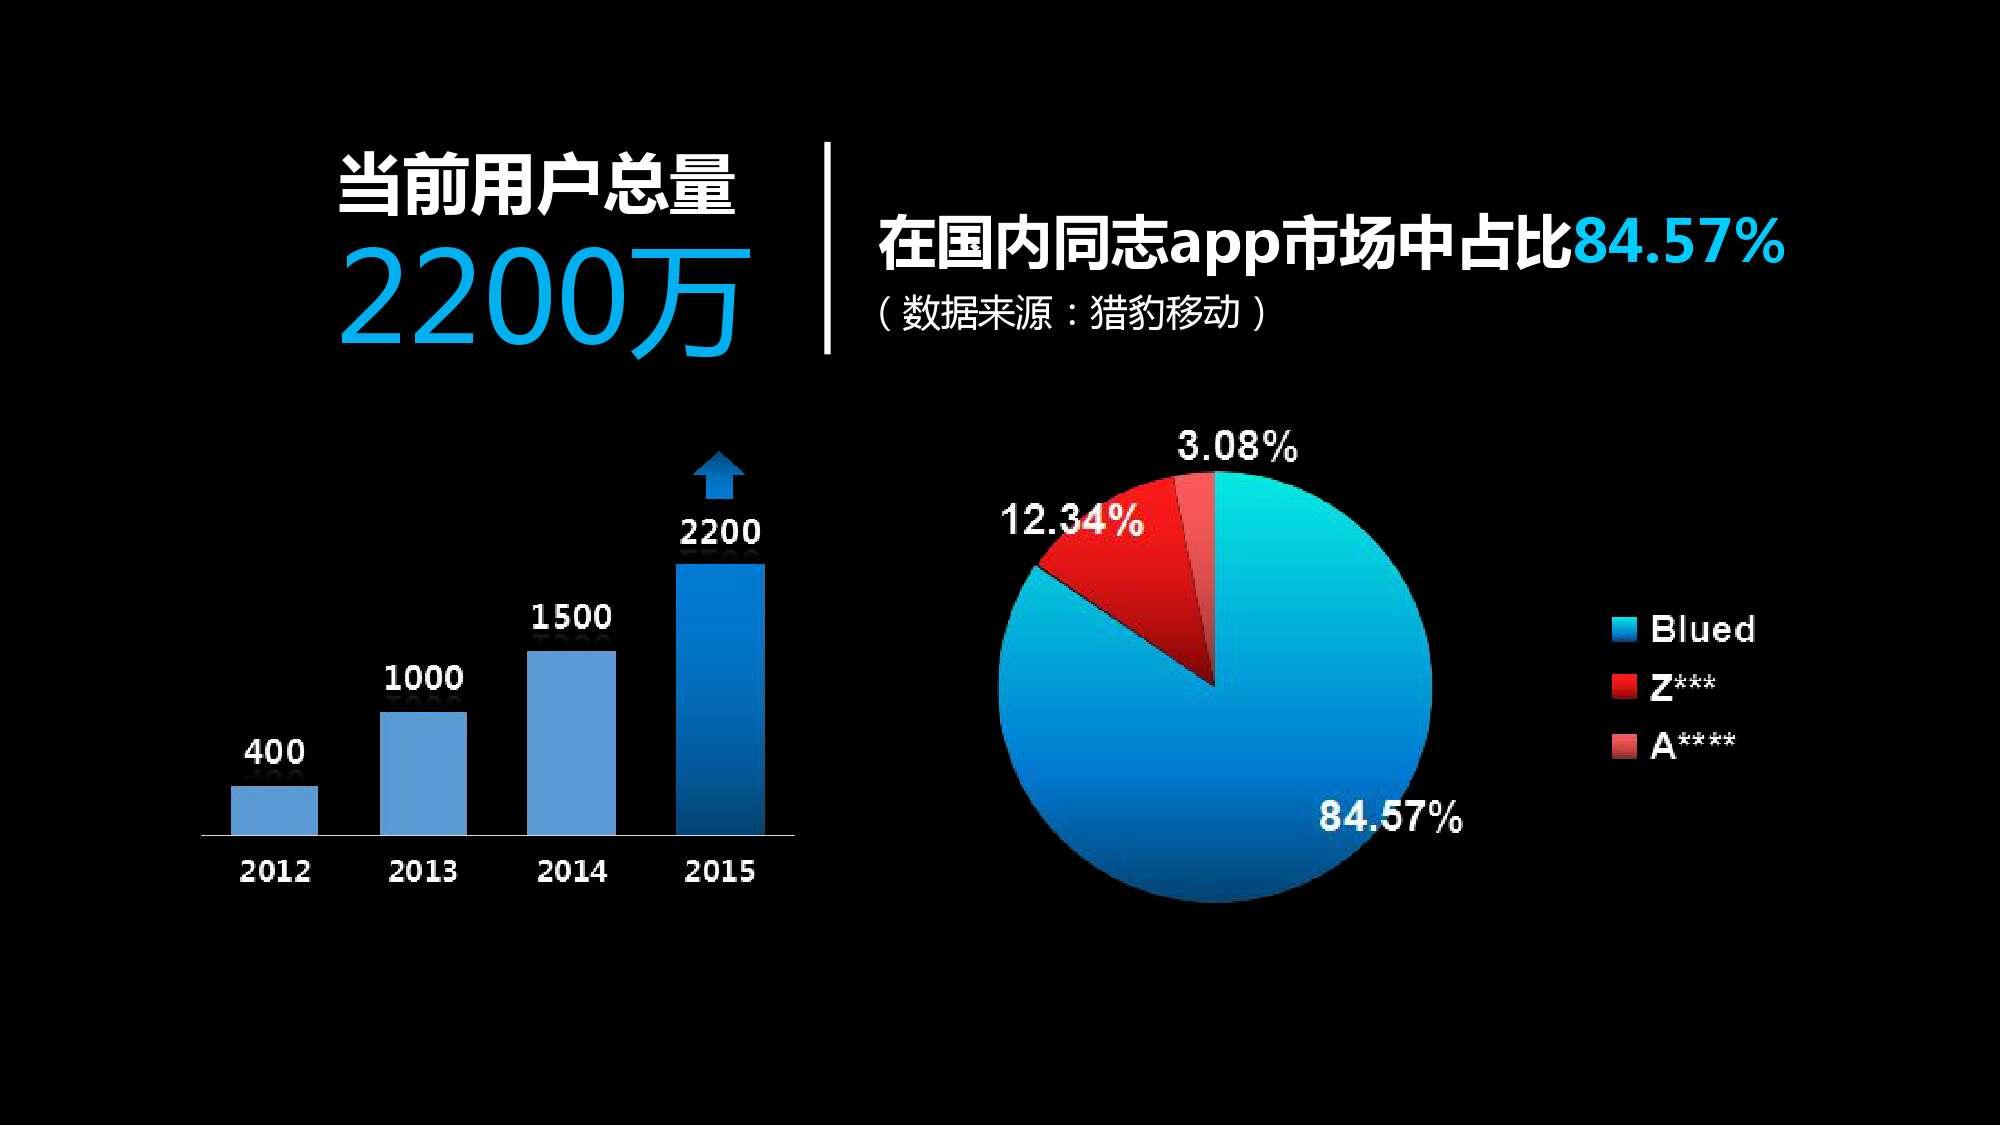 Blued2015中国同志社群大数据白皮书_000005